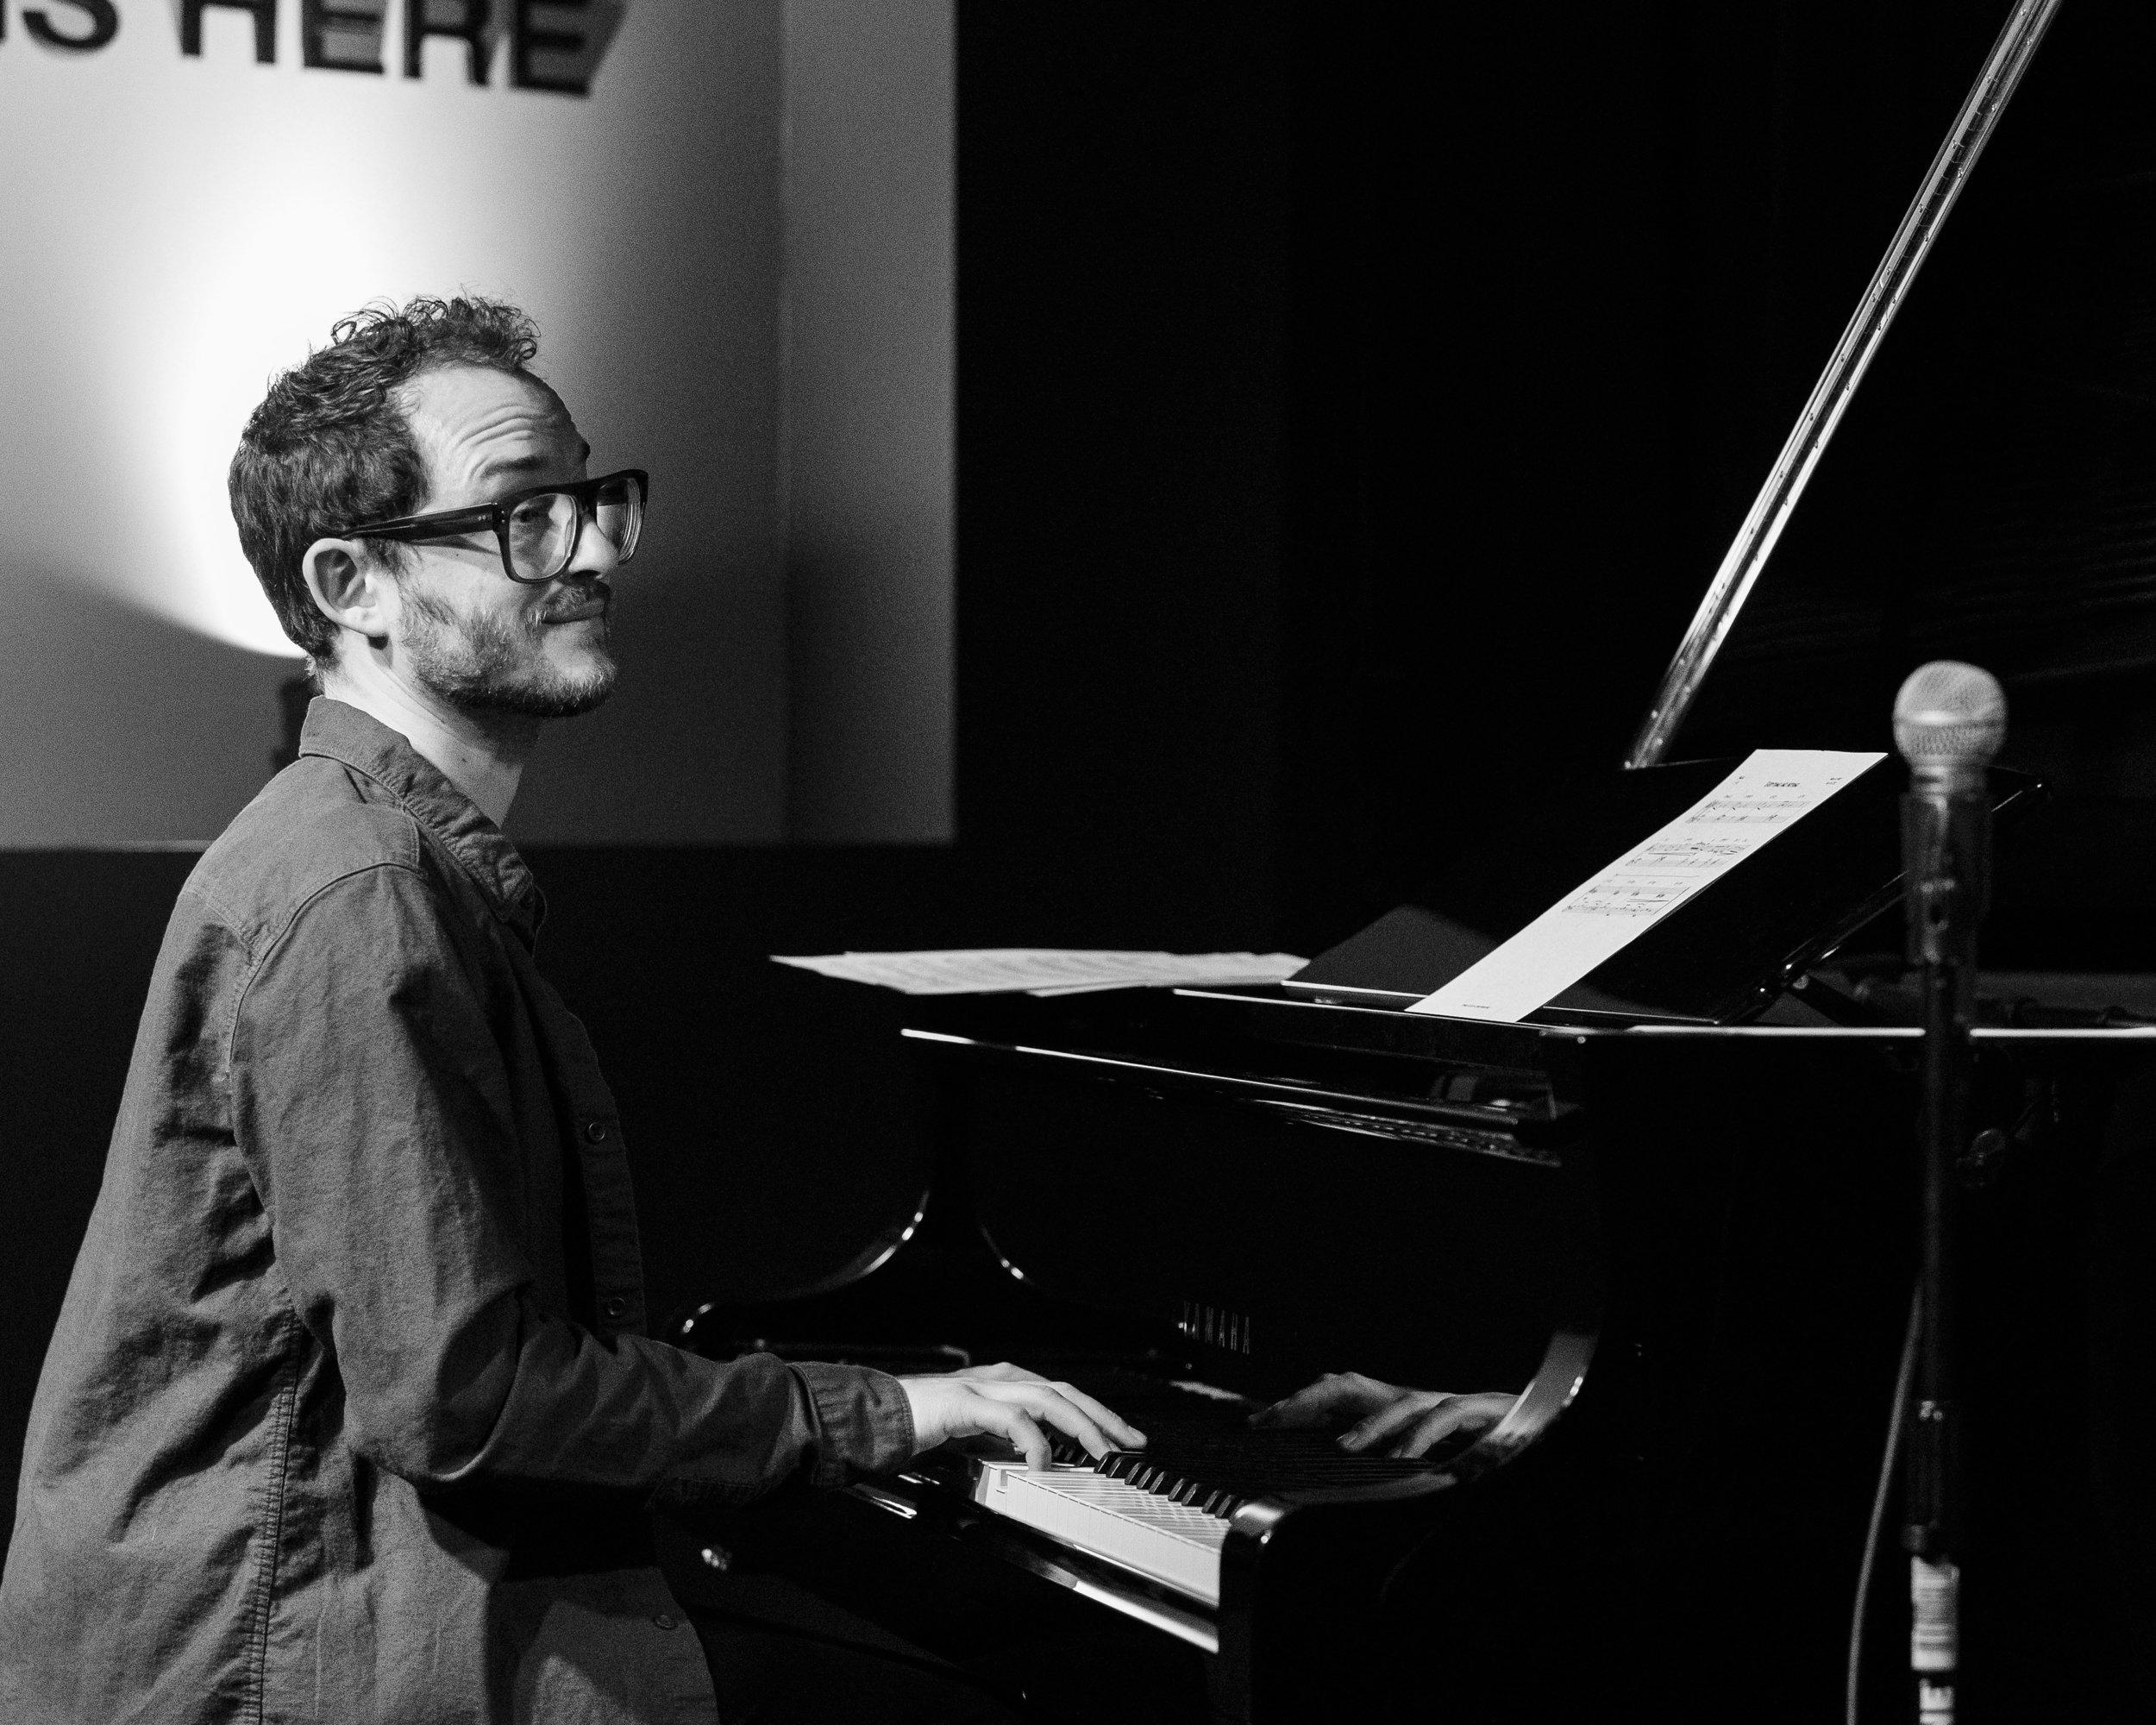 Pascal Le Boeuf and Remy Le Boeuf Jazz Music